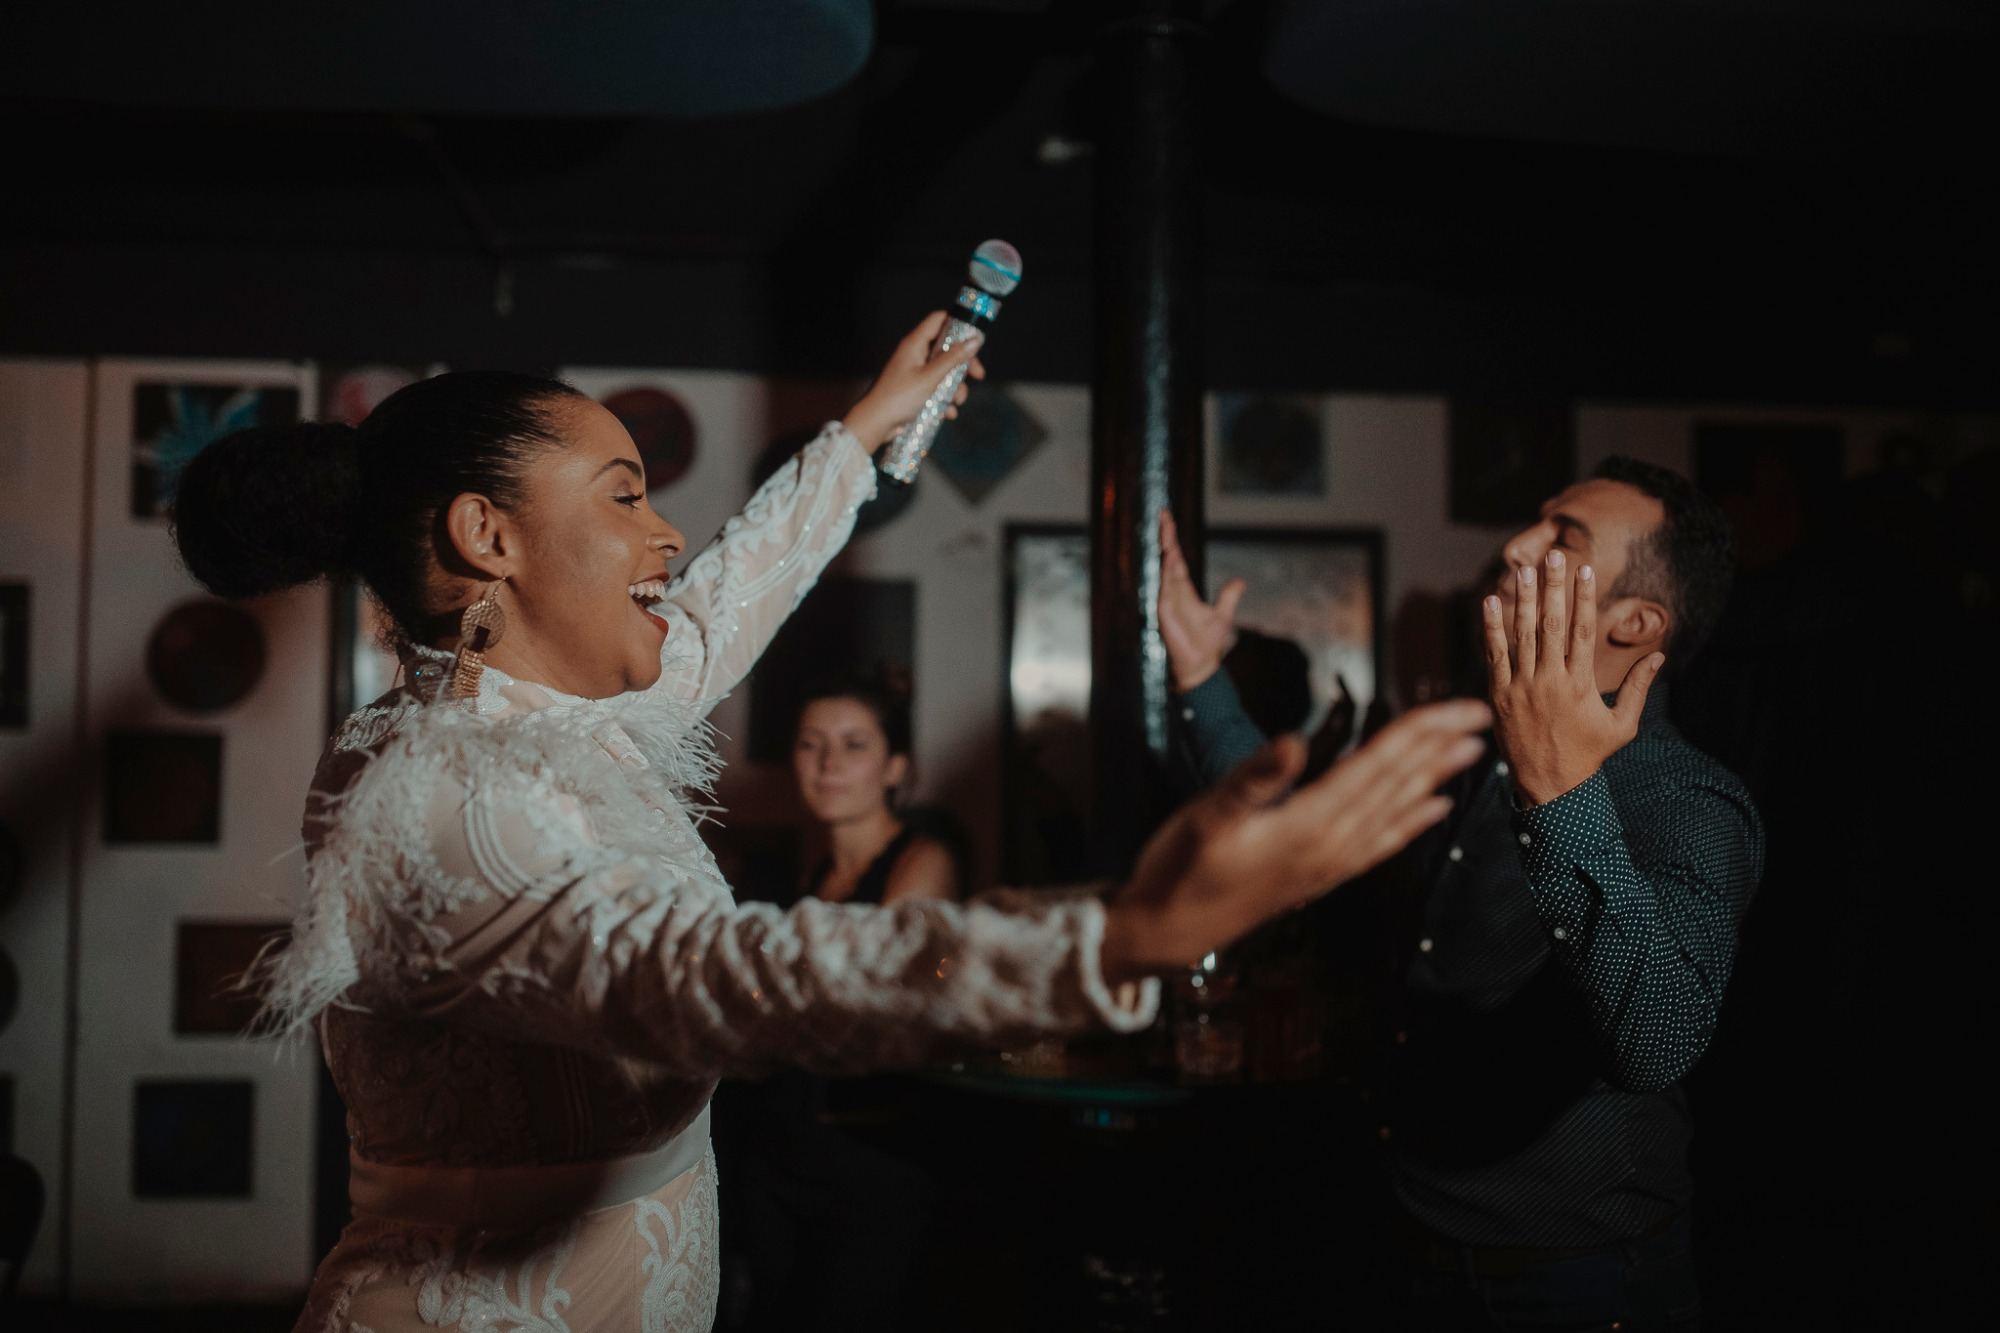 Promo Laura Soul Valore Solo Soul / Motown Singer London